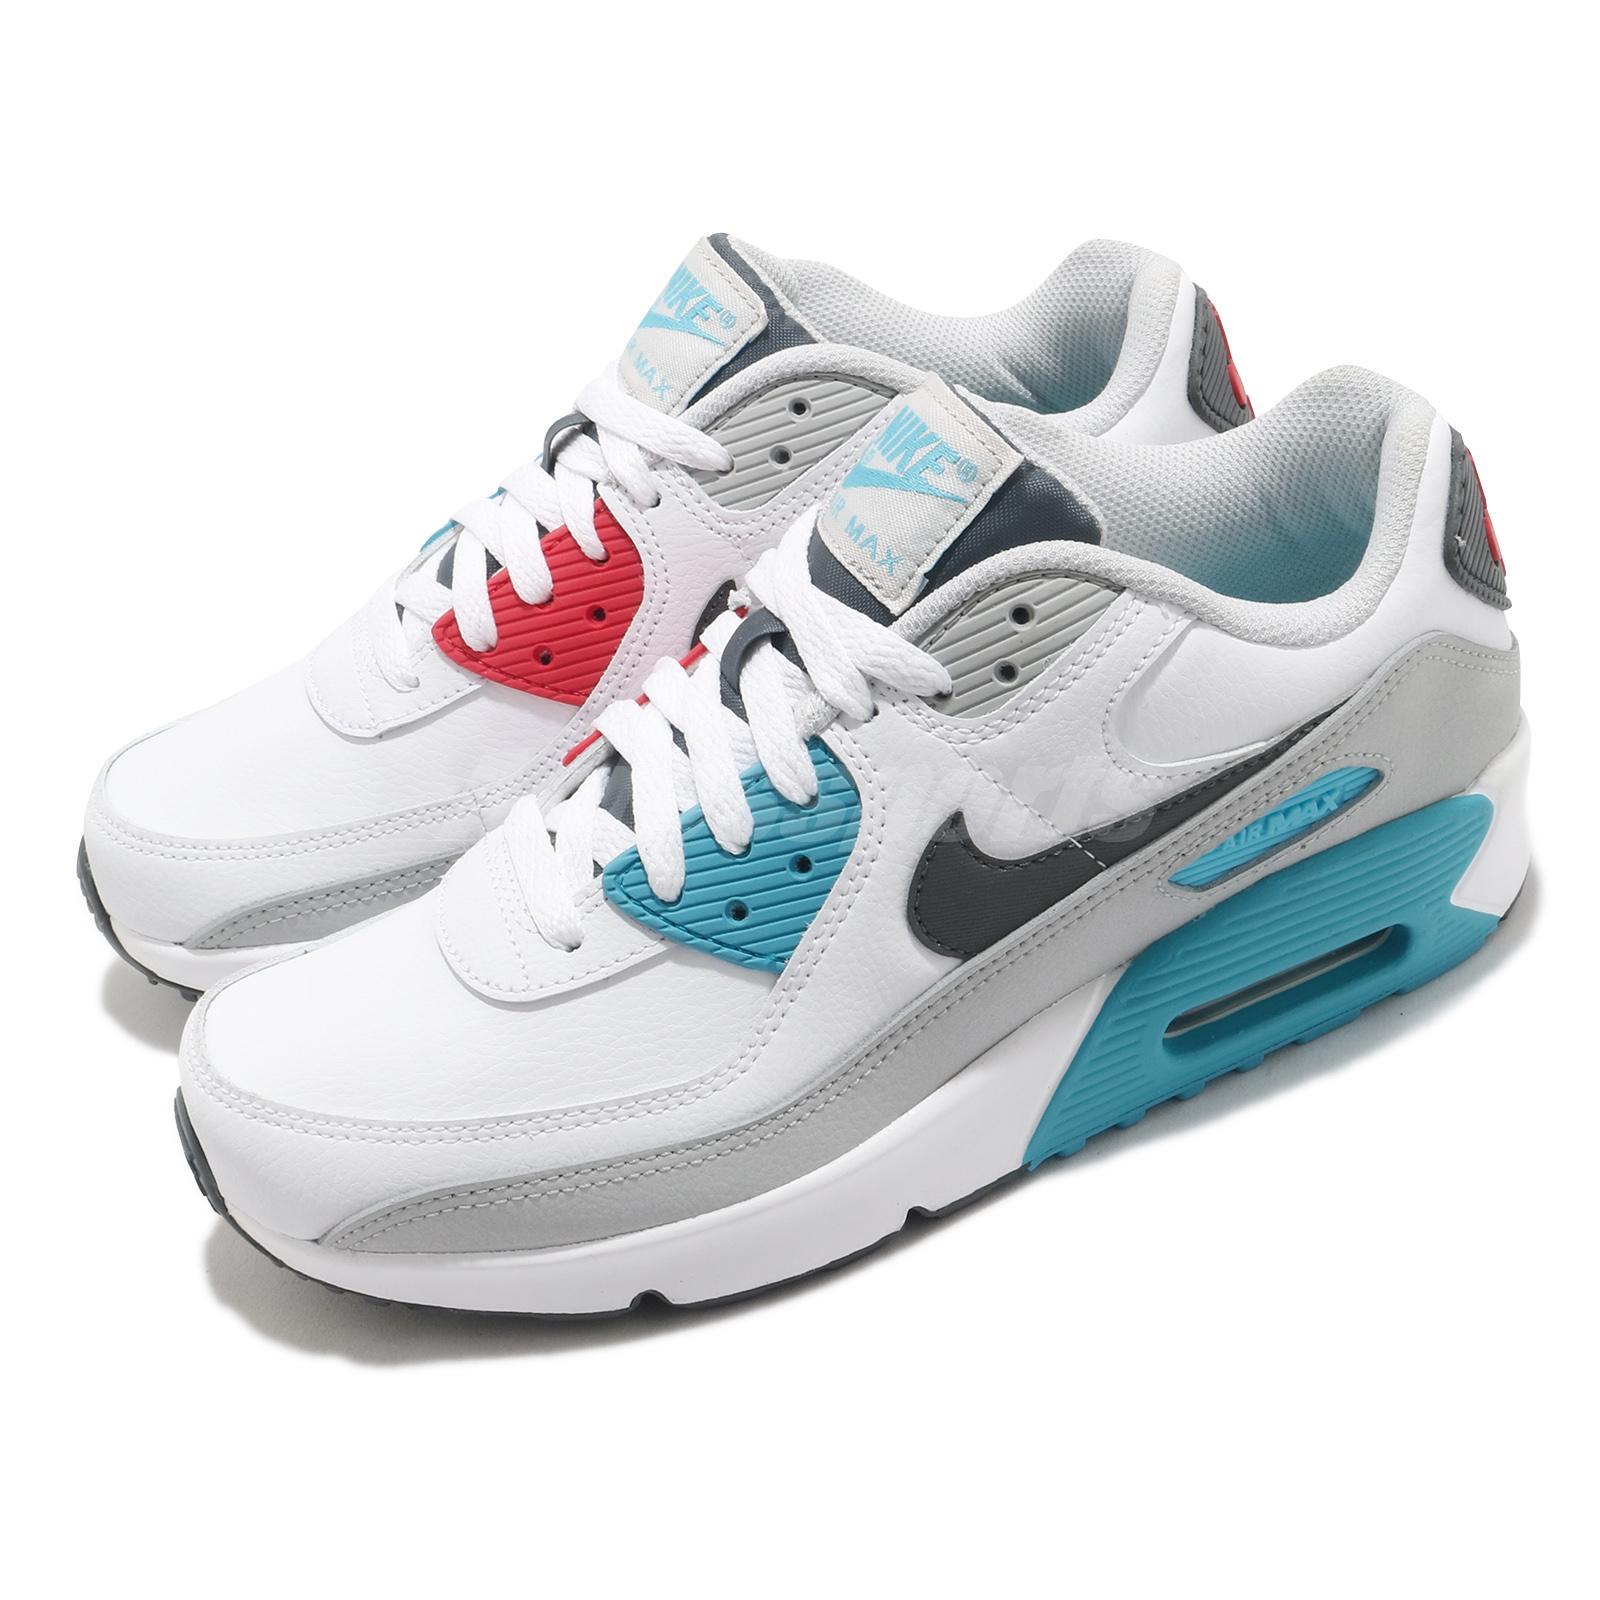 Nike Air Max 90 LTR GS White Grey Chlorine Blue Red Kid Women ...